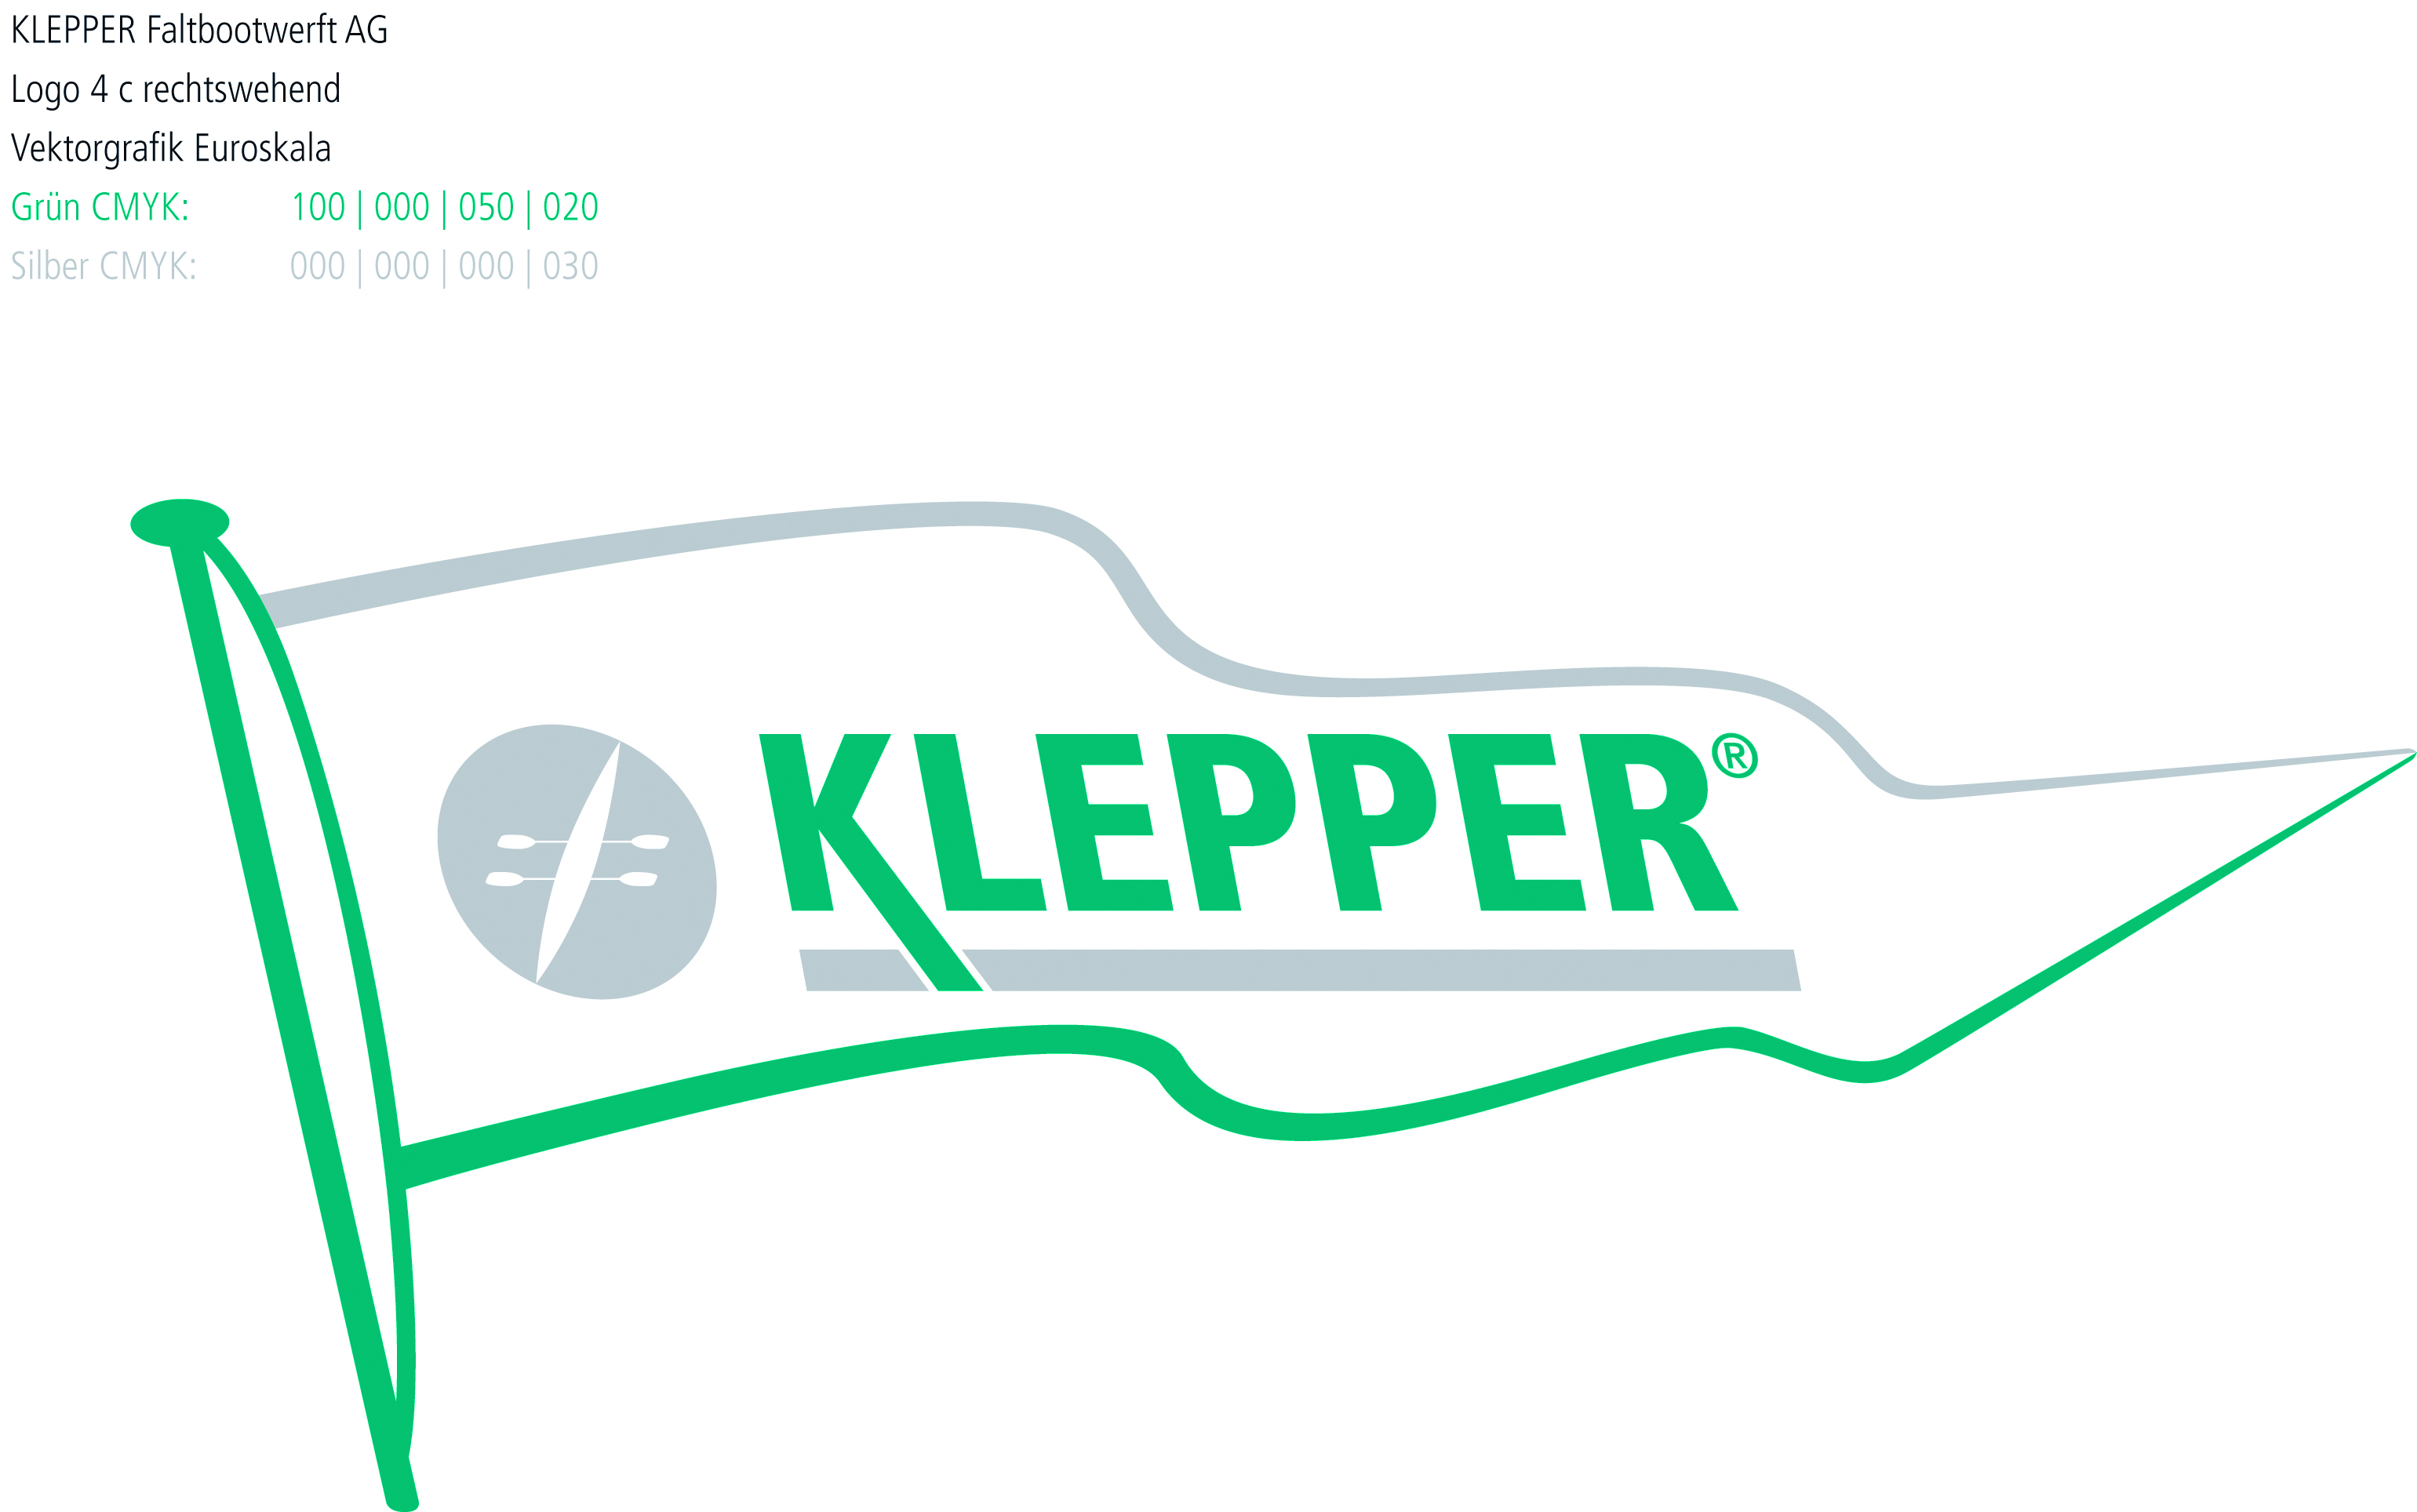 Klepper Faltbootwerft